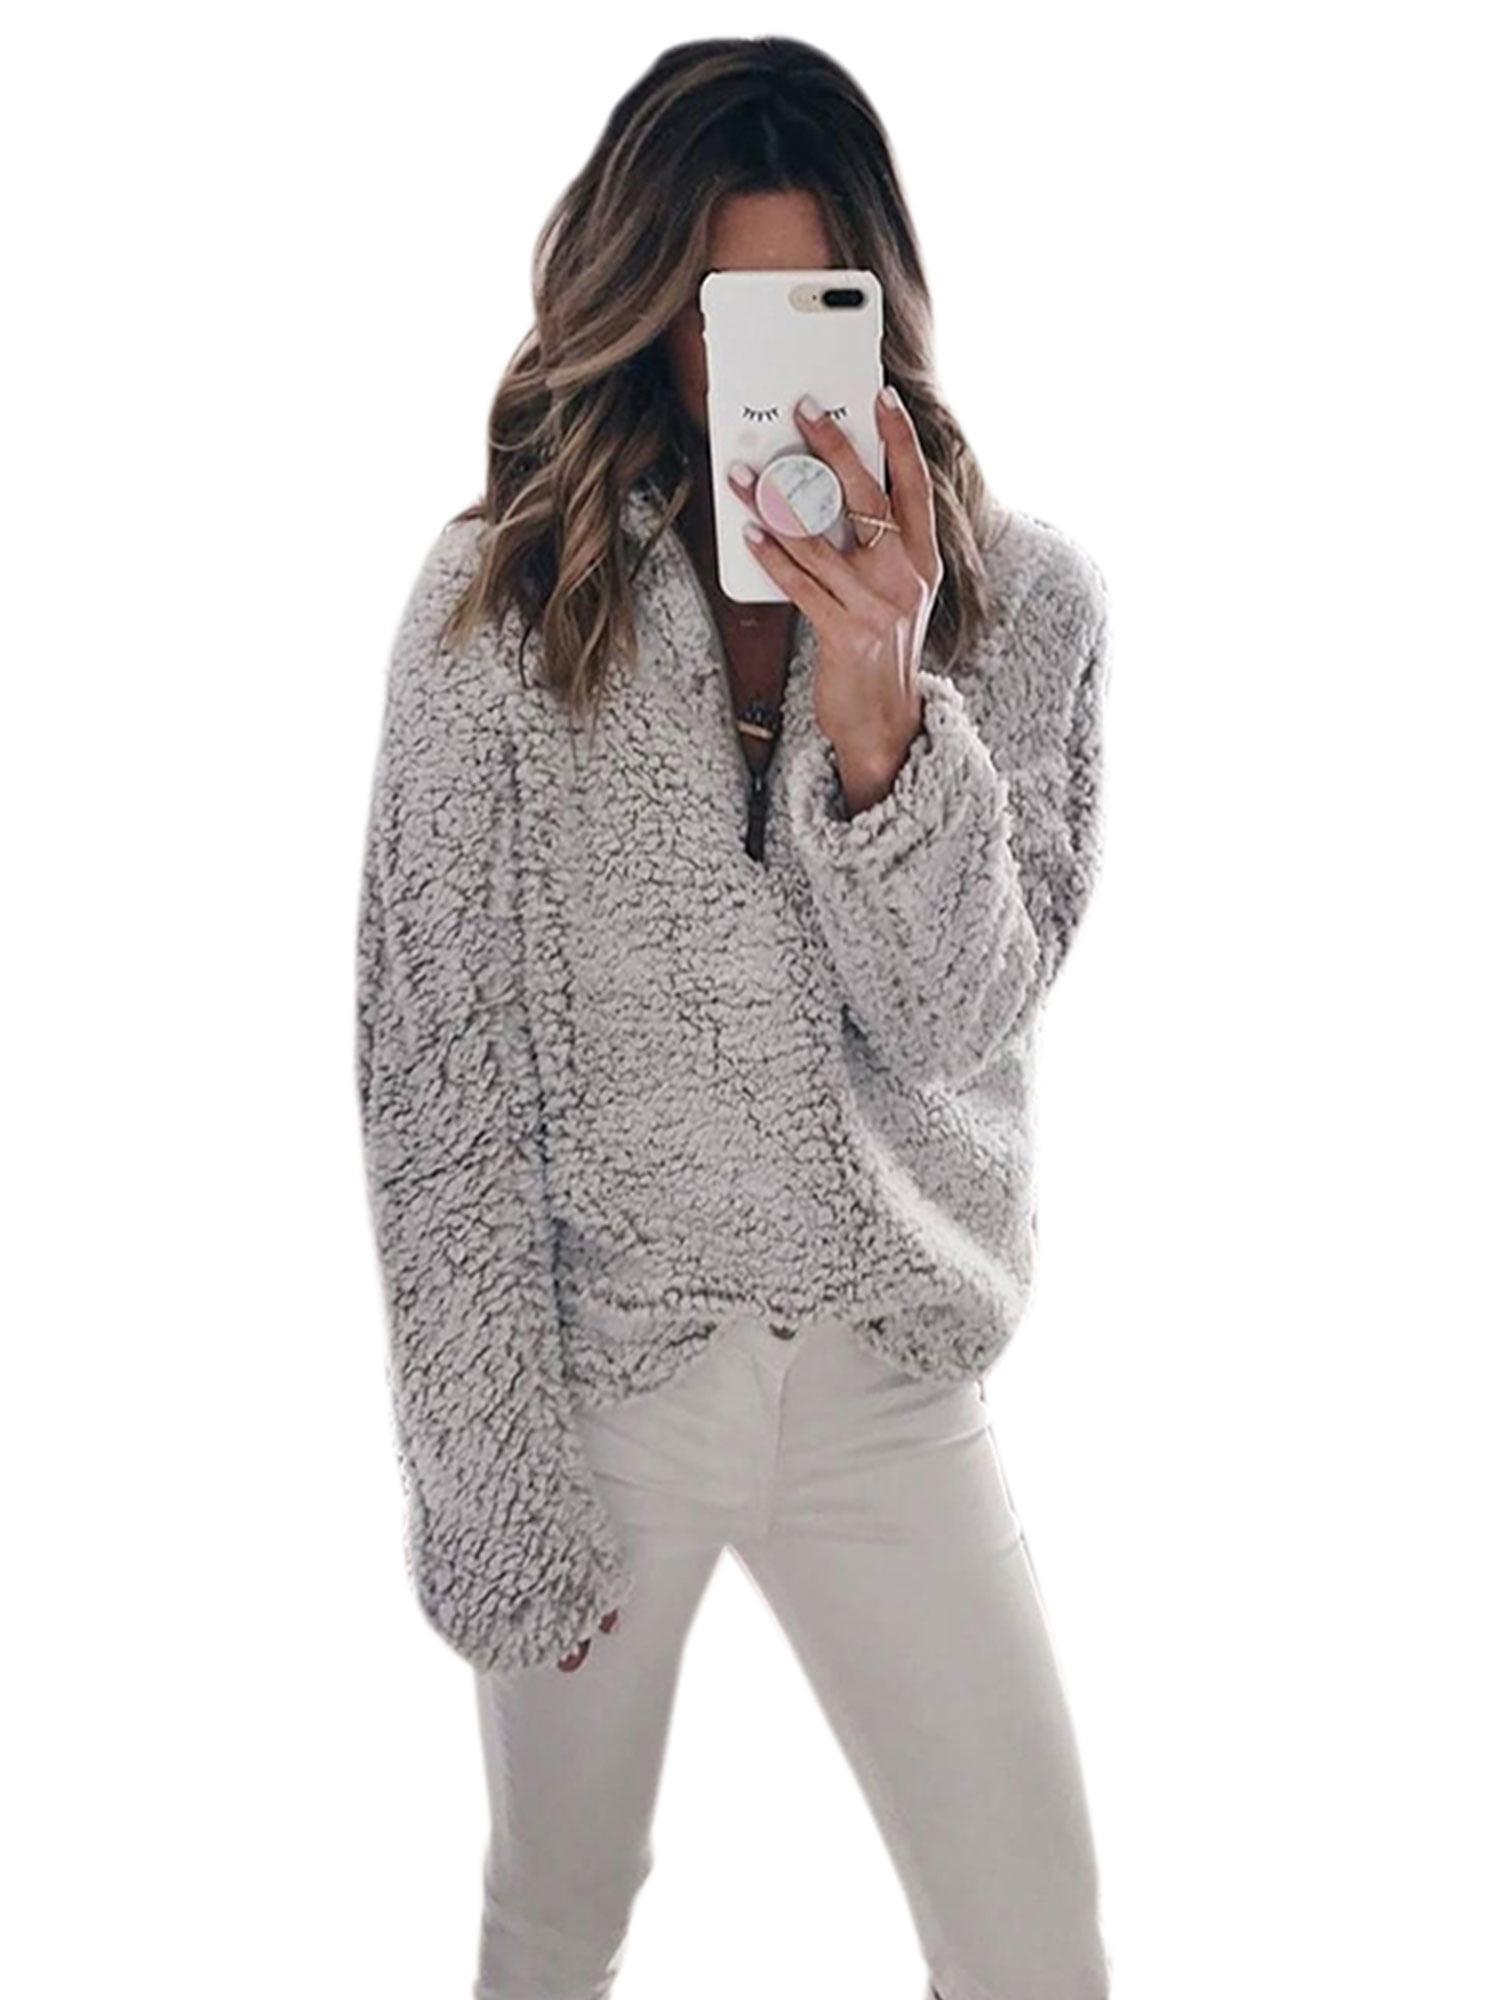 LIYT Womens Faux Fure Coat Winter Warm Jacket Cardigan Outerwear Tops